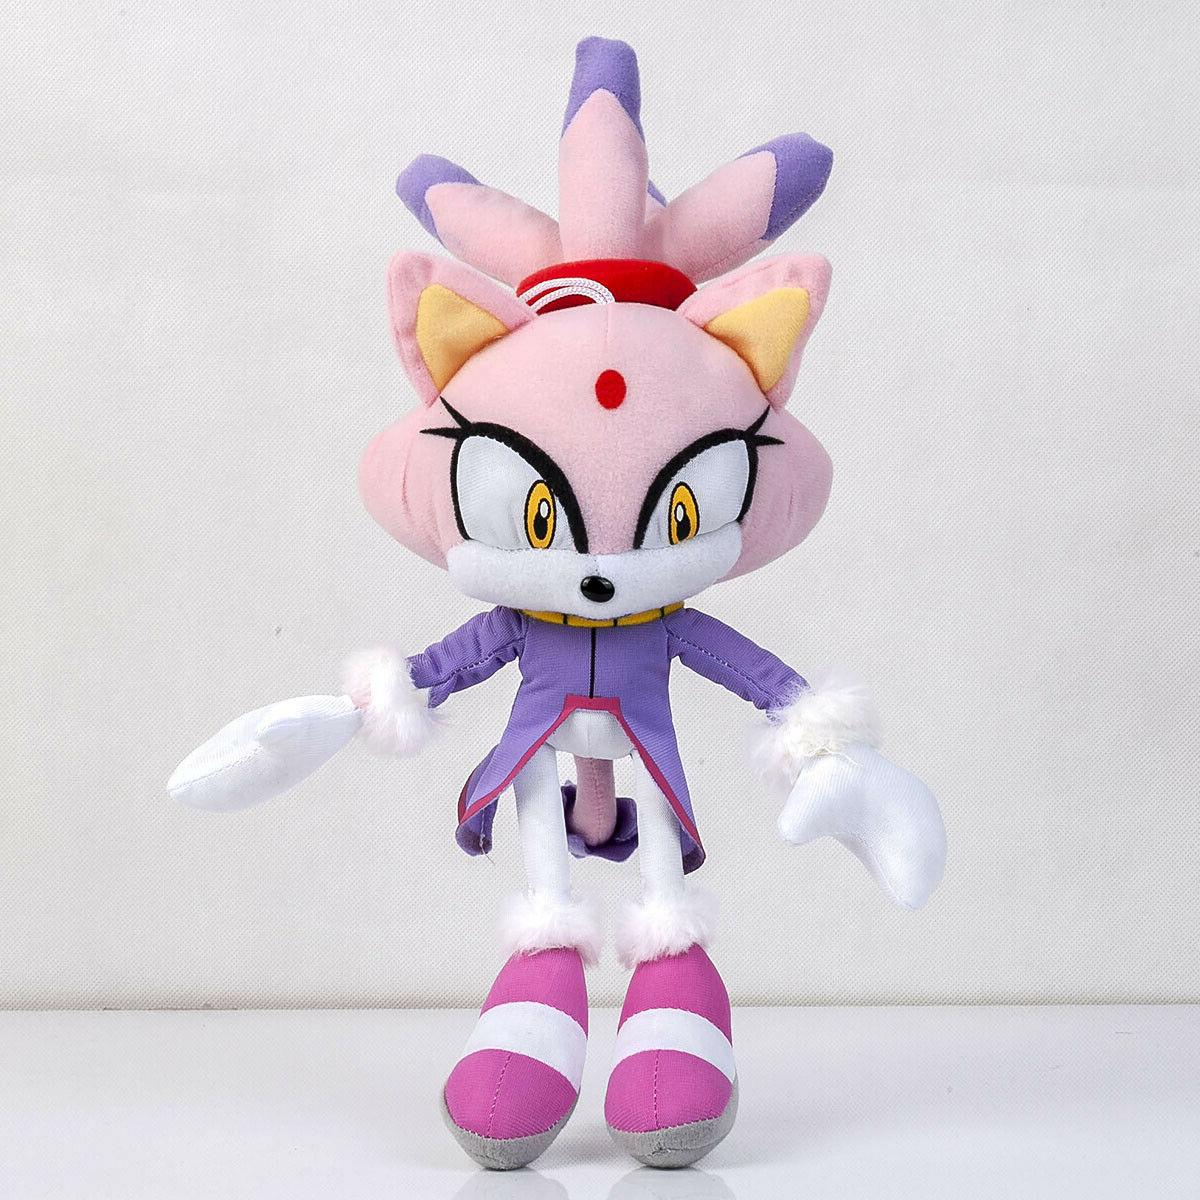 Blaze Plush Doll Stuffed Soft Toy Gift 13 In